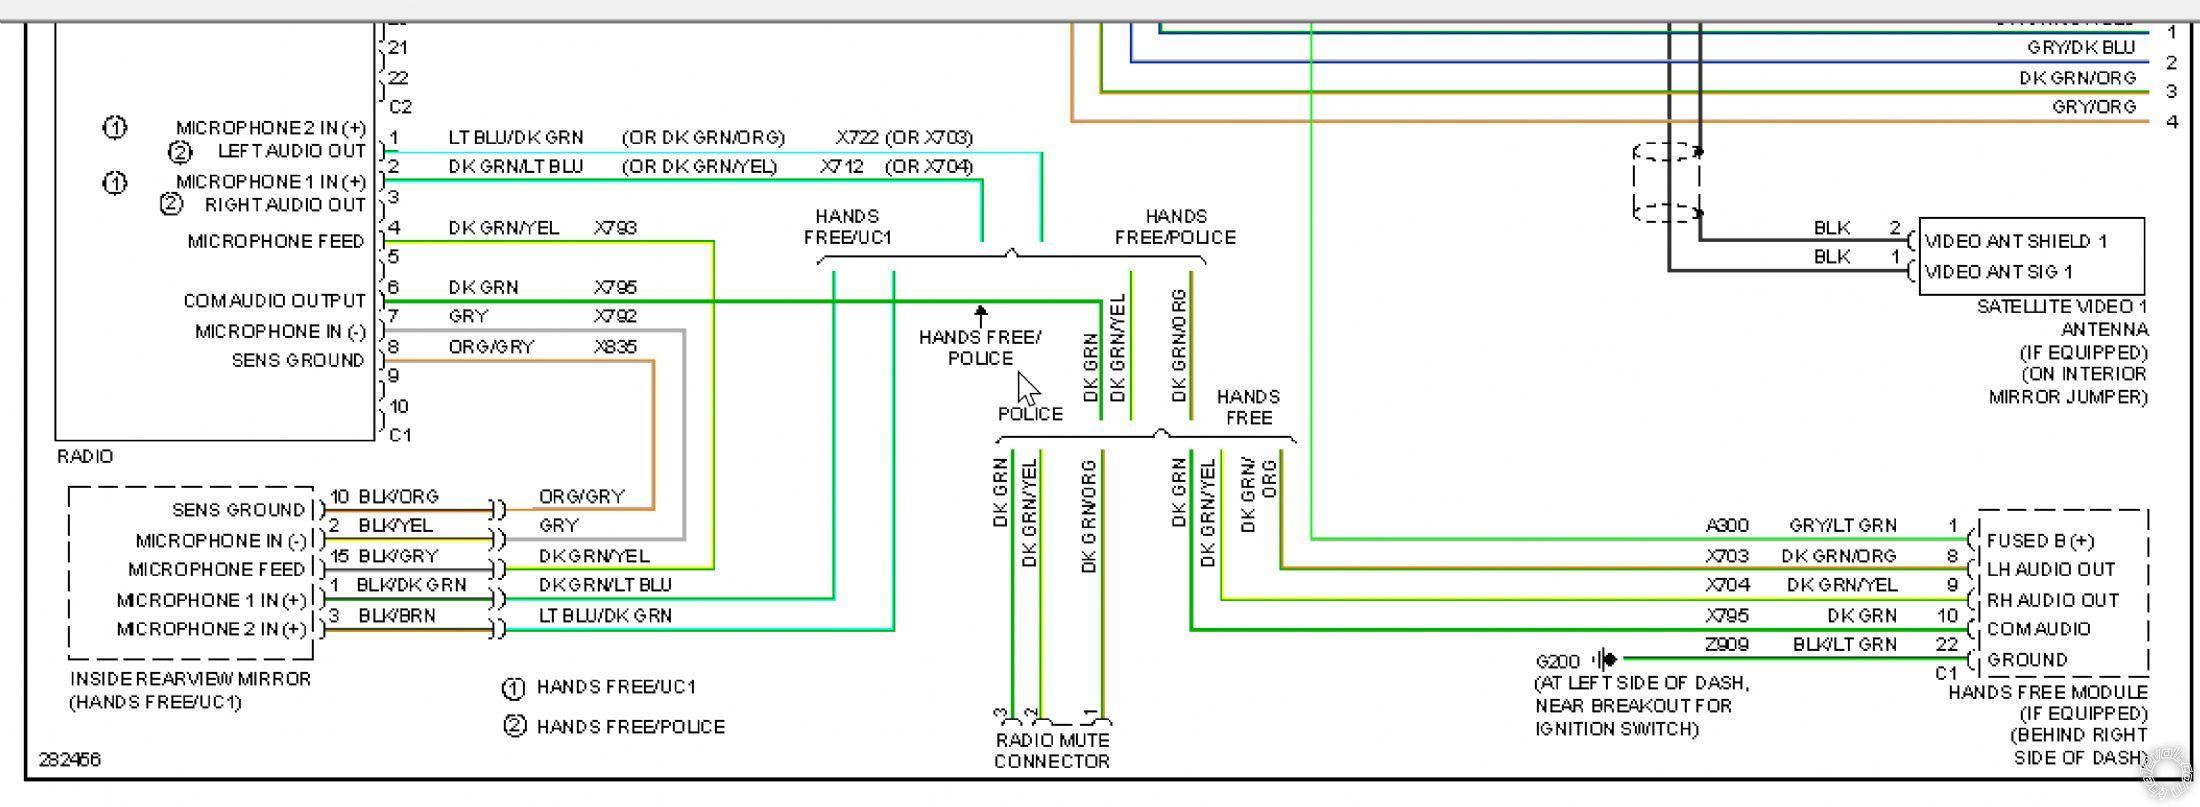 Dodge Charger Rt Radio Wiring Diagram